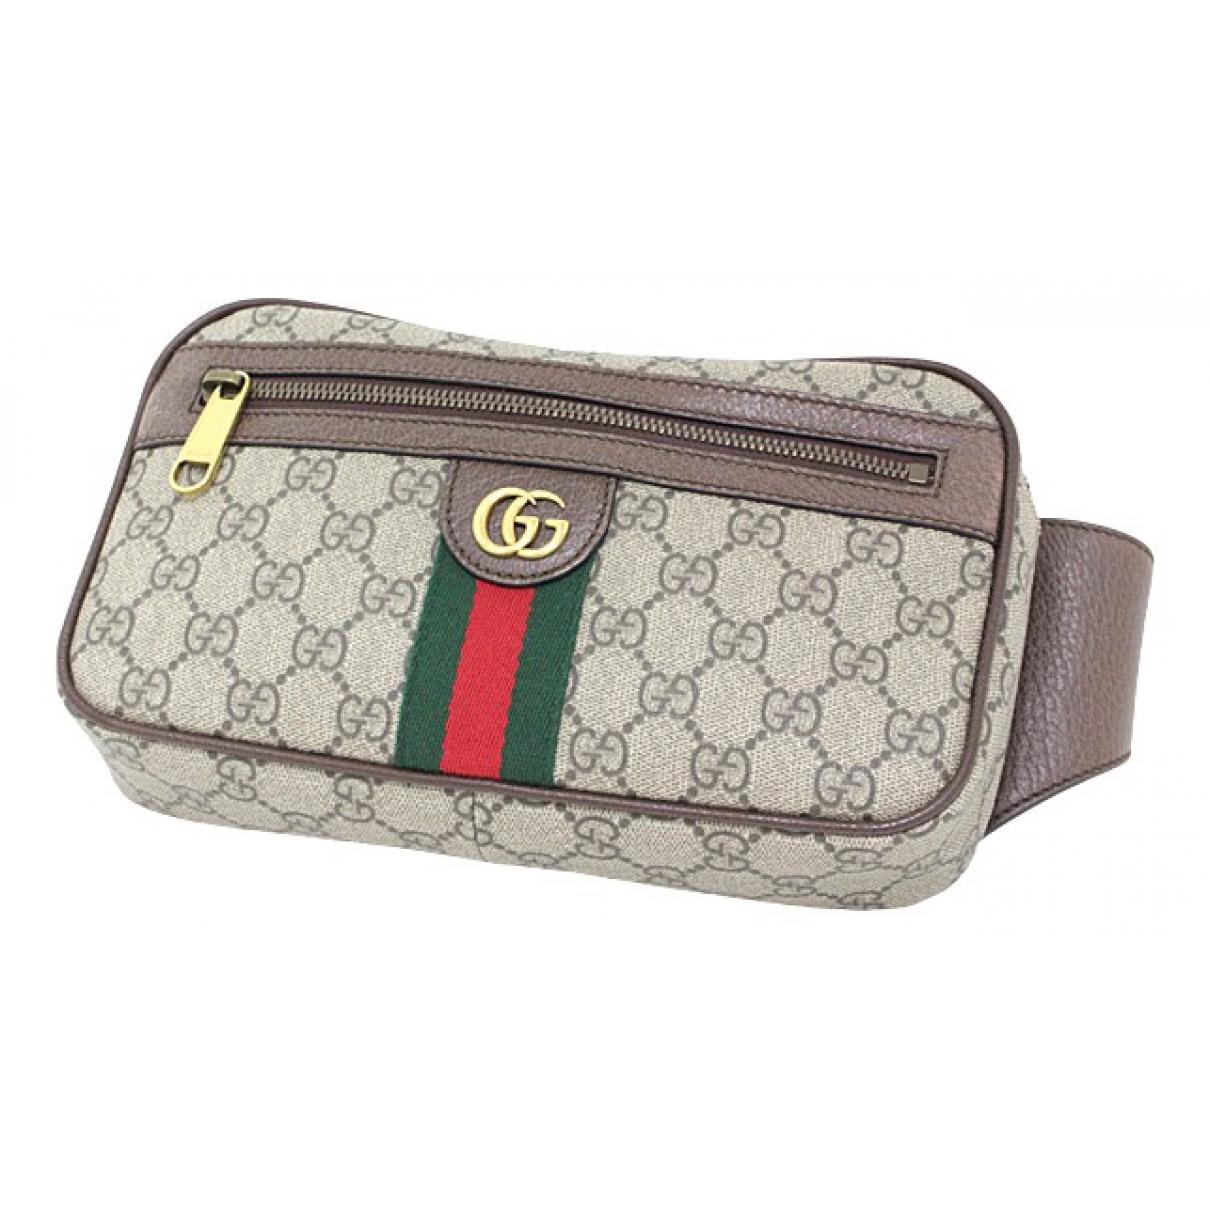 Gucci Ophidia Beige Cloth Clutch bag for Women N